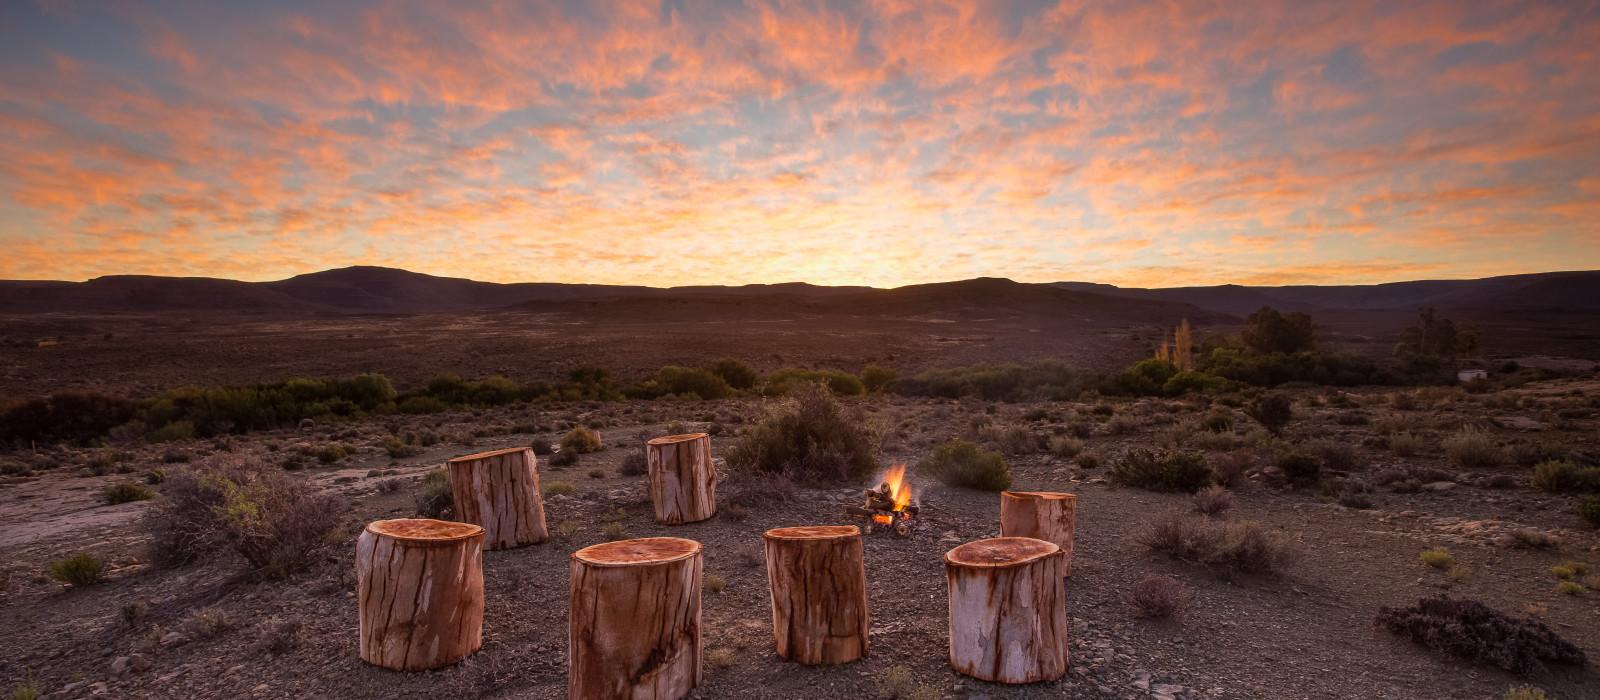 Safari-Klassiker in Simbabwe und Botswana Urlaub 1